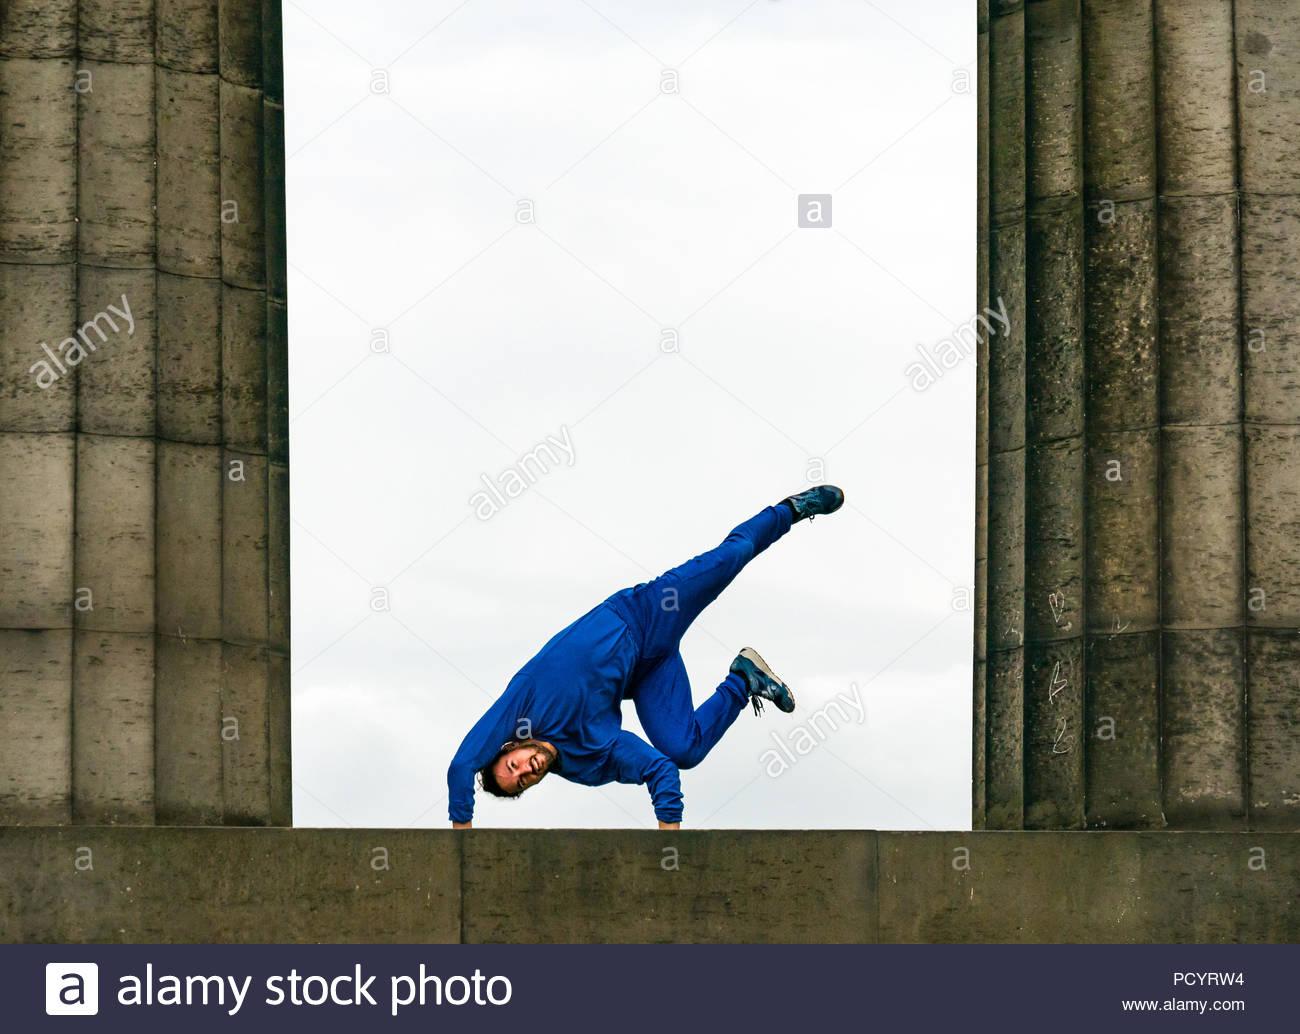 Barely Methodical Troupe (BMT) perform acrobatics on Calton Hill photocall during Fringe festIval at the National Monument, Edinburgh, Scotland, UK - Stock Image